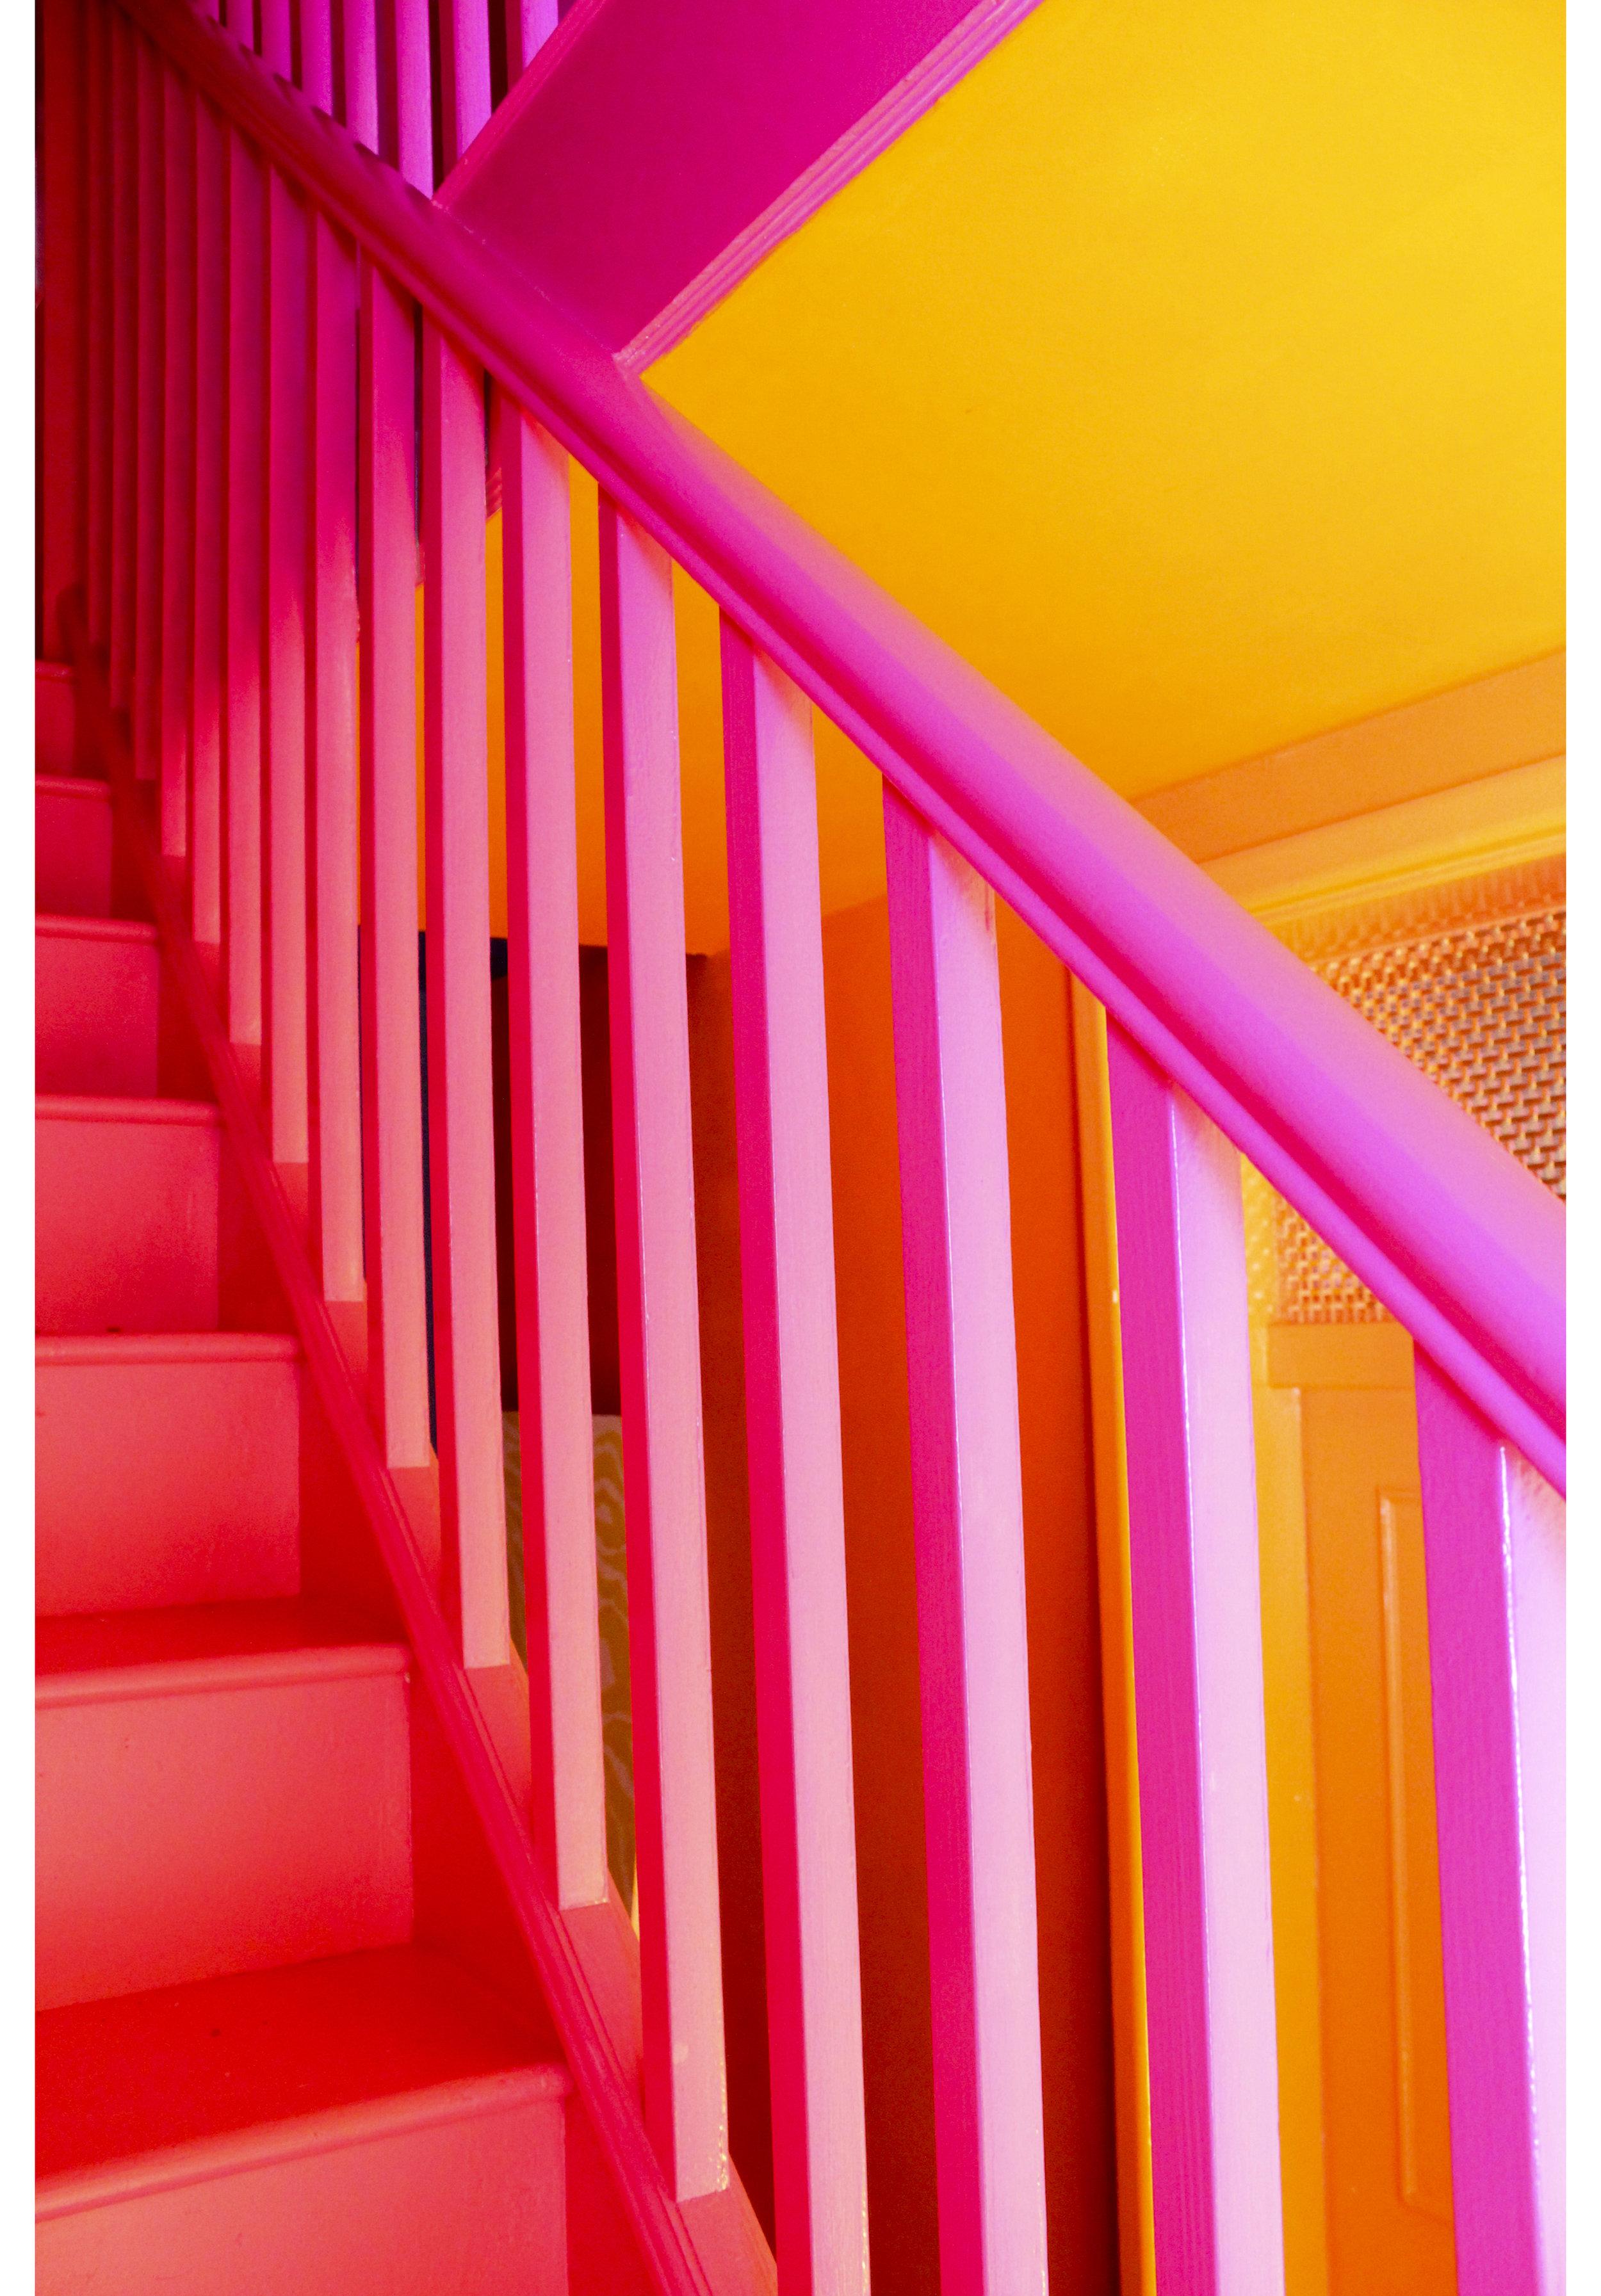 MLH Pink Bannisters Orange Ceiling.jpg